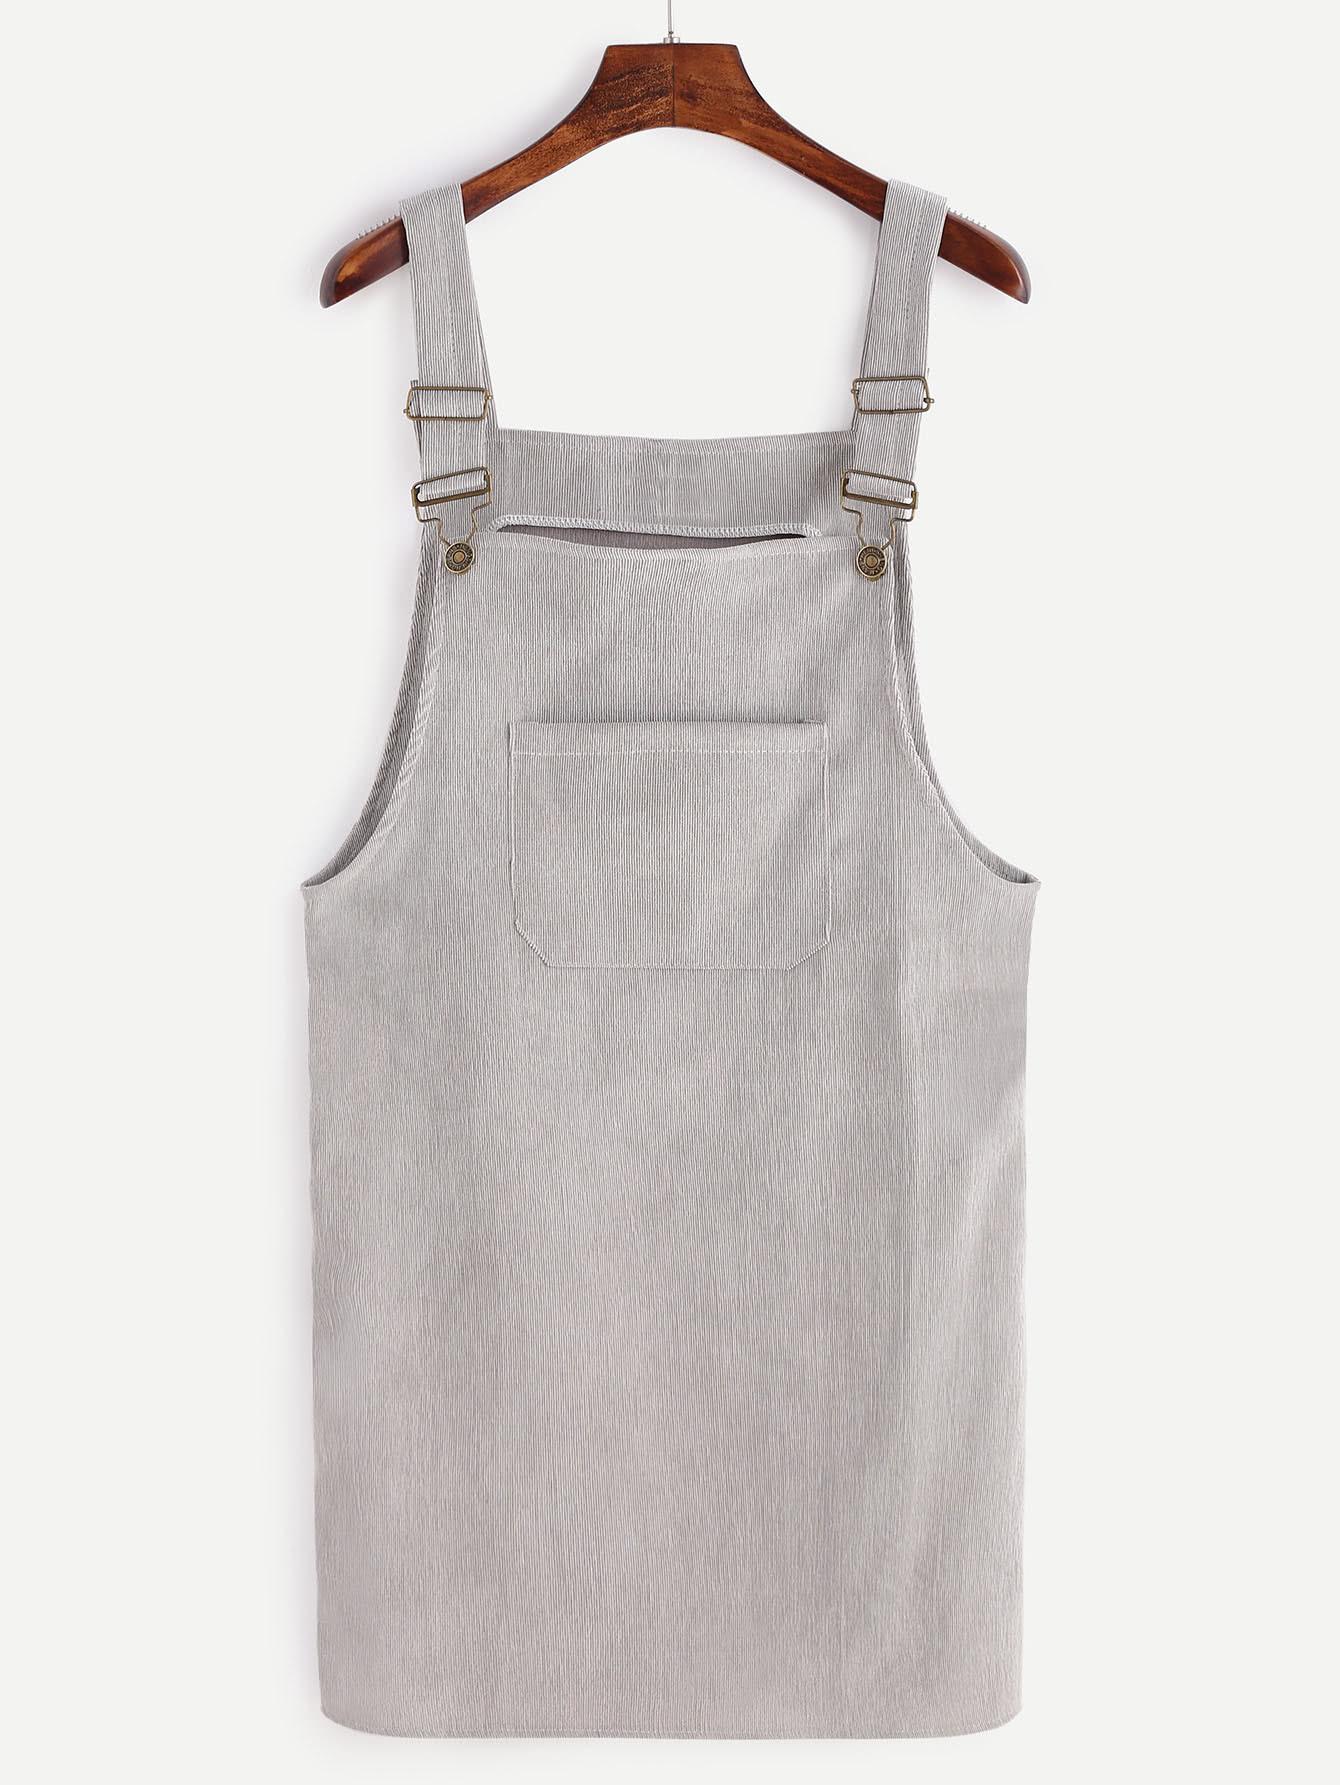 Grey Corduroy Overall Dress With Pocket dress161021101